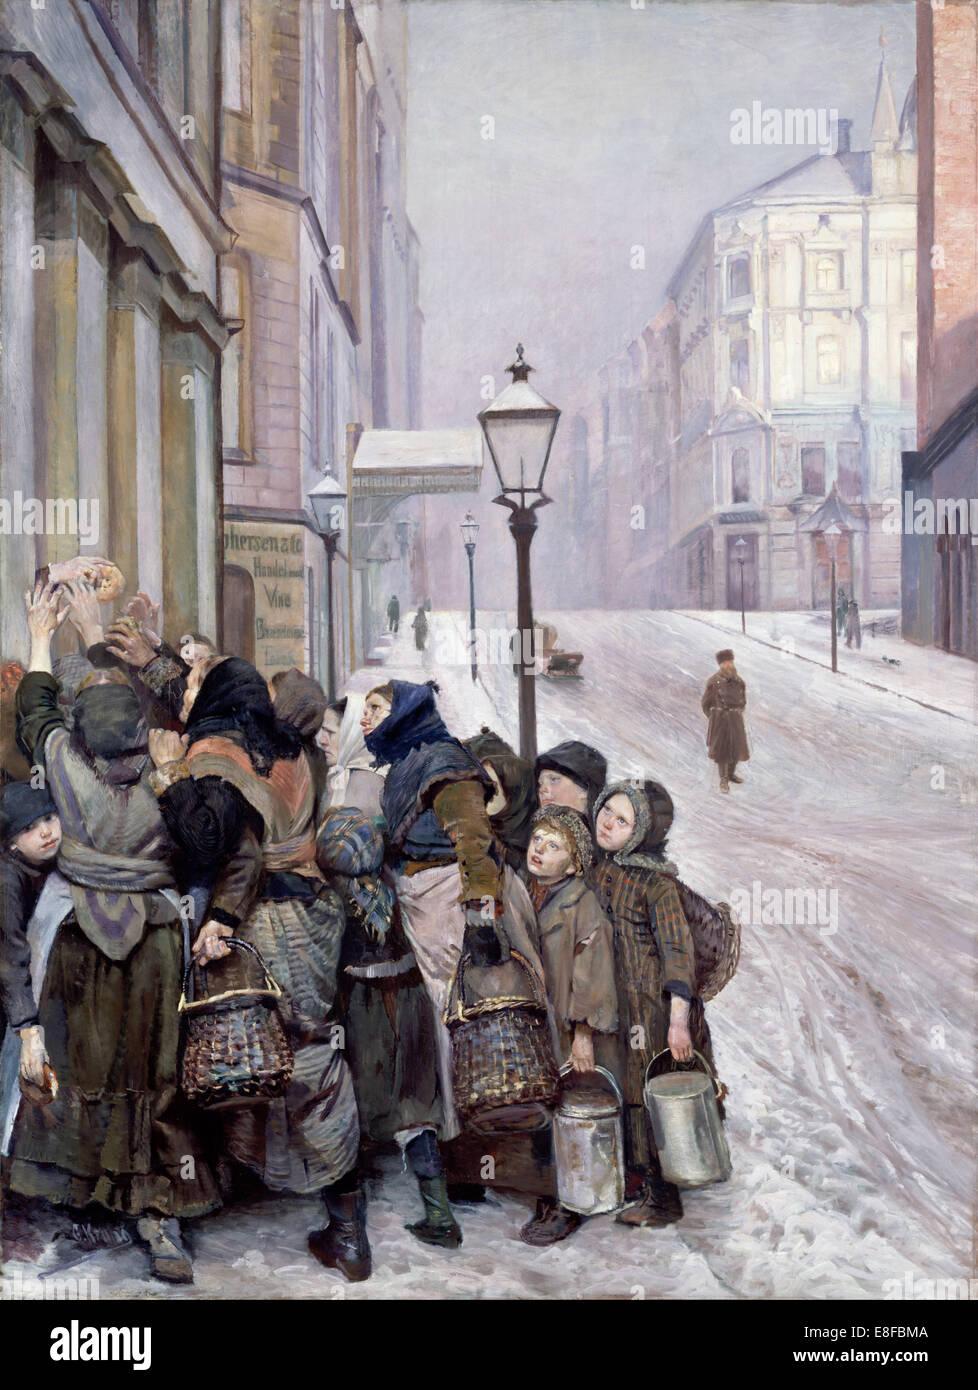 Struggle for Survival. Artist: Krohg, Christian (1852-1925) - Stock Image